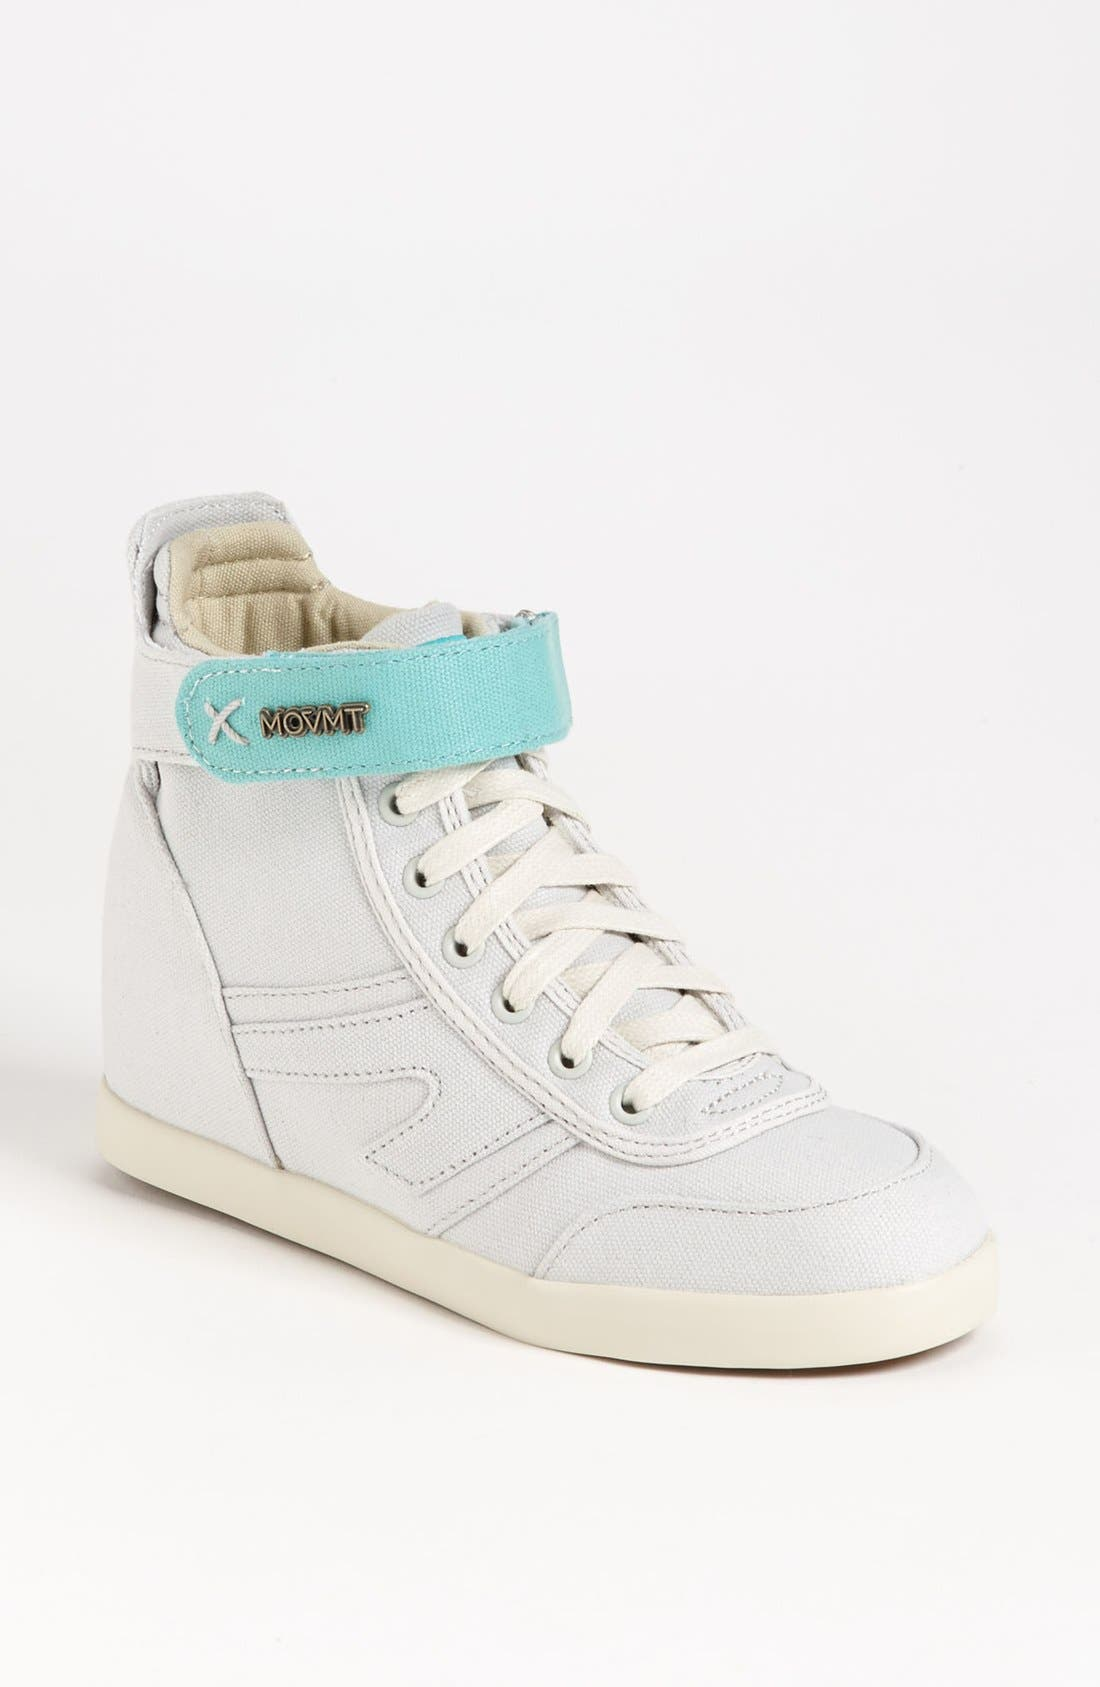 Alternate Image 1 Selected - The People's Movement 'Jade' Wedge Sneaker